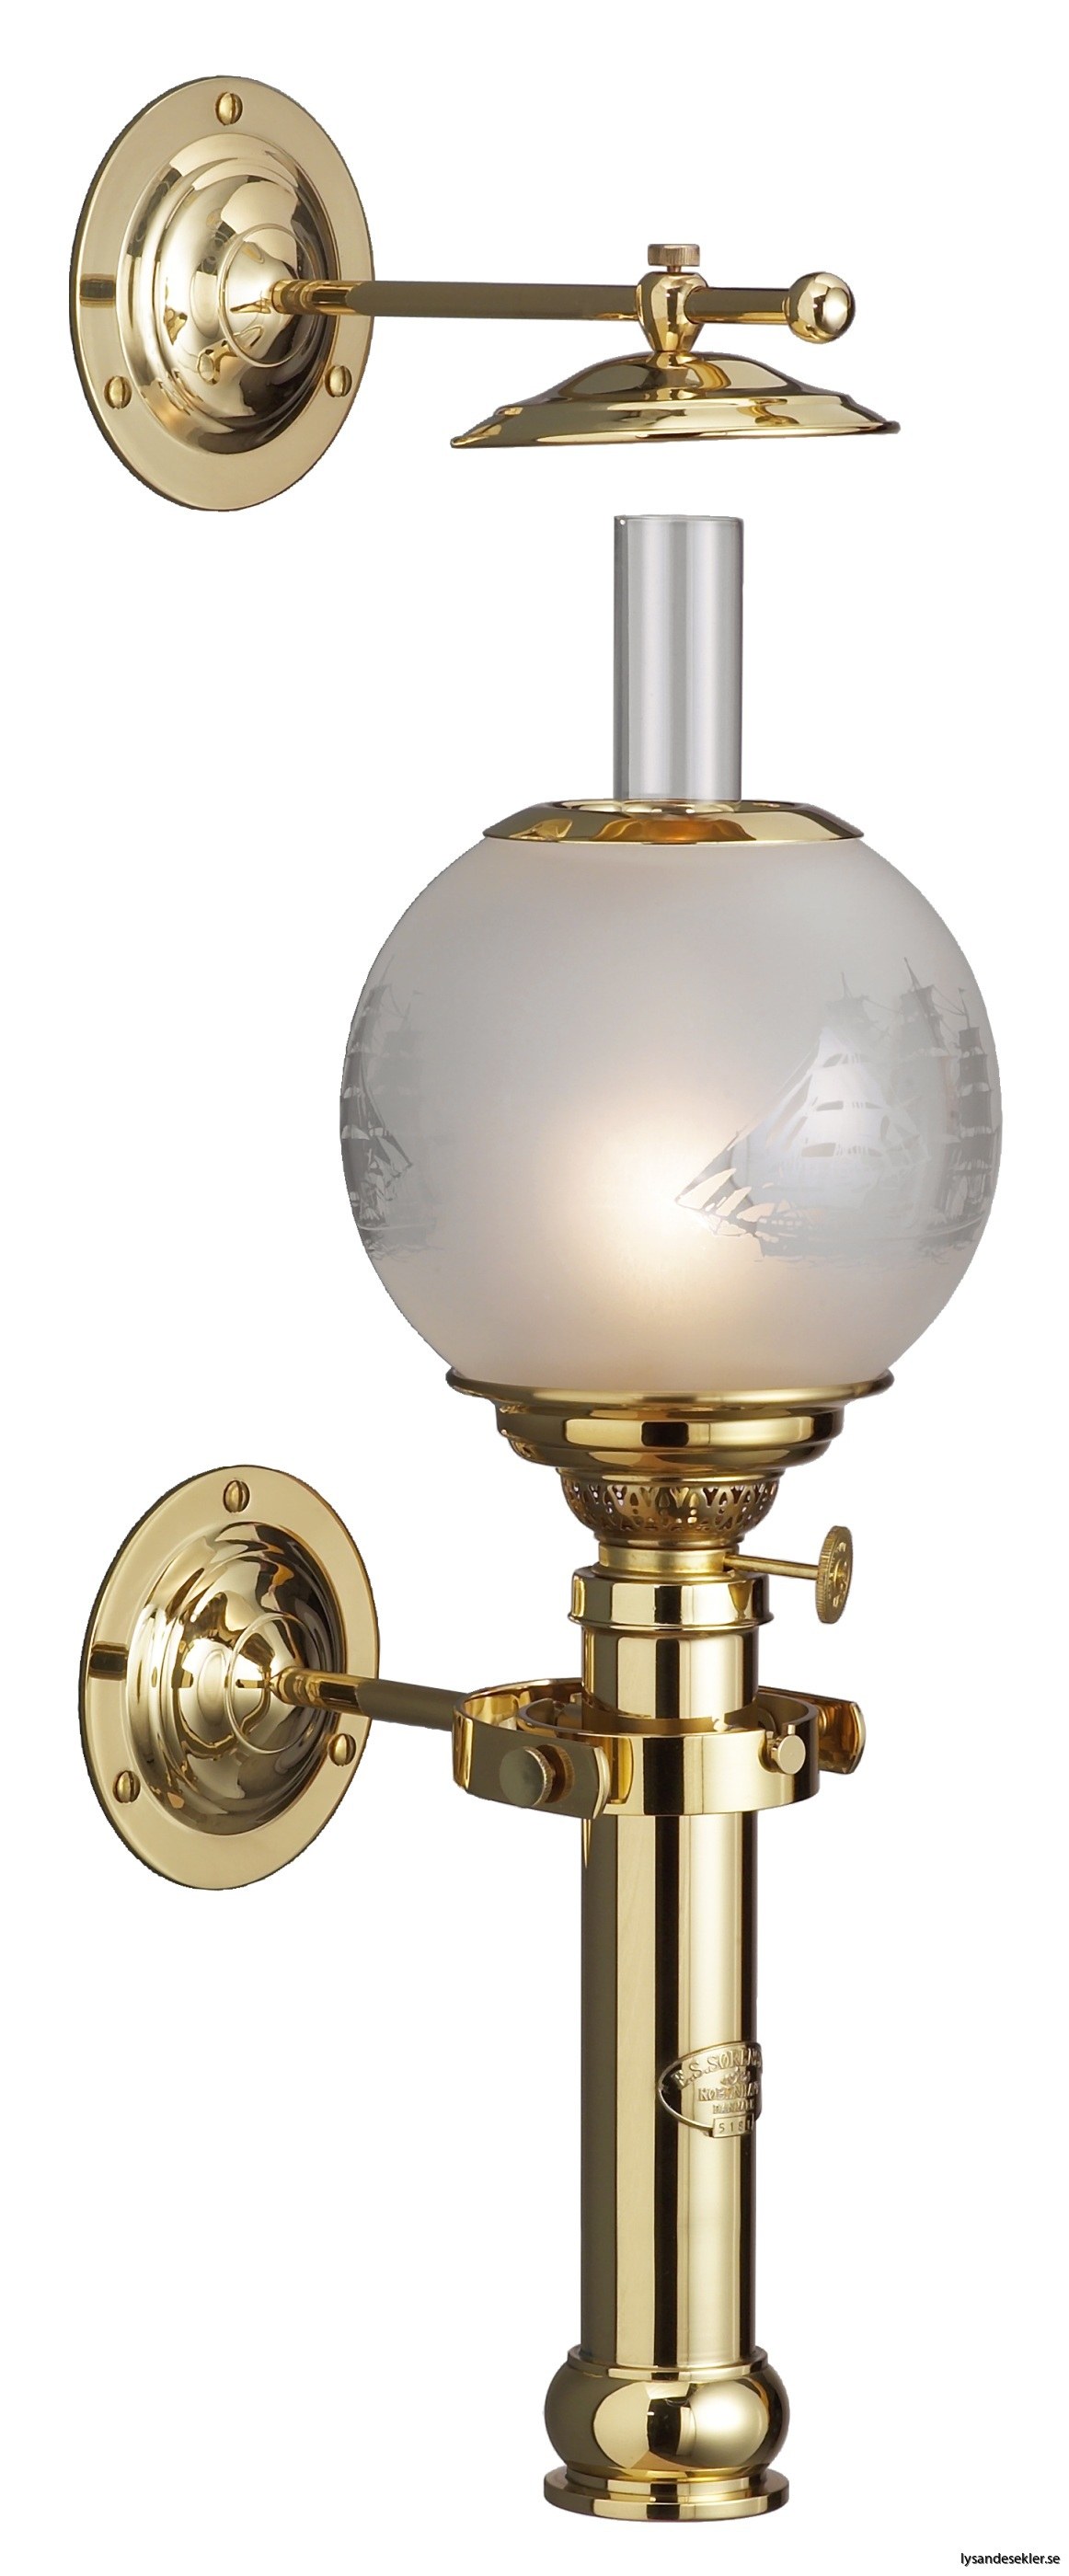 captains cabin lamp dansk fotogenlampa sorensen mässing